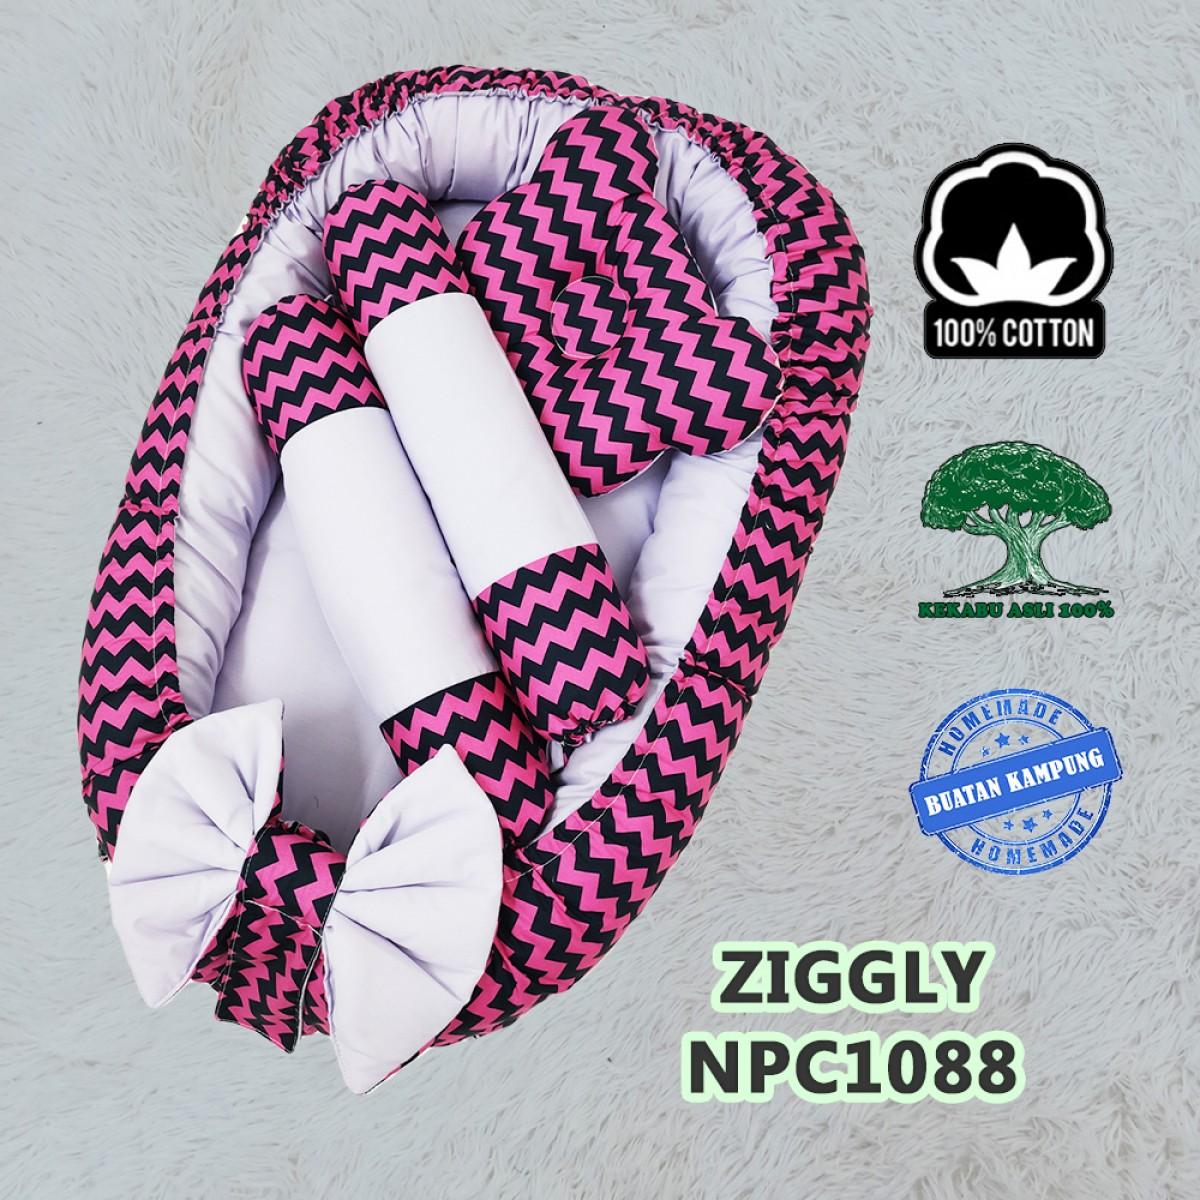 Ziggly - Kico Baby Center